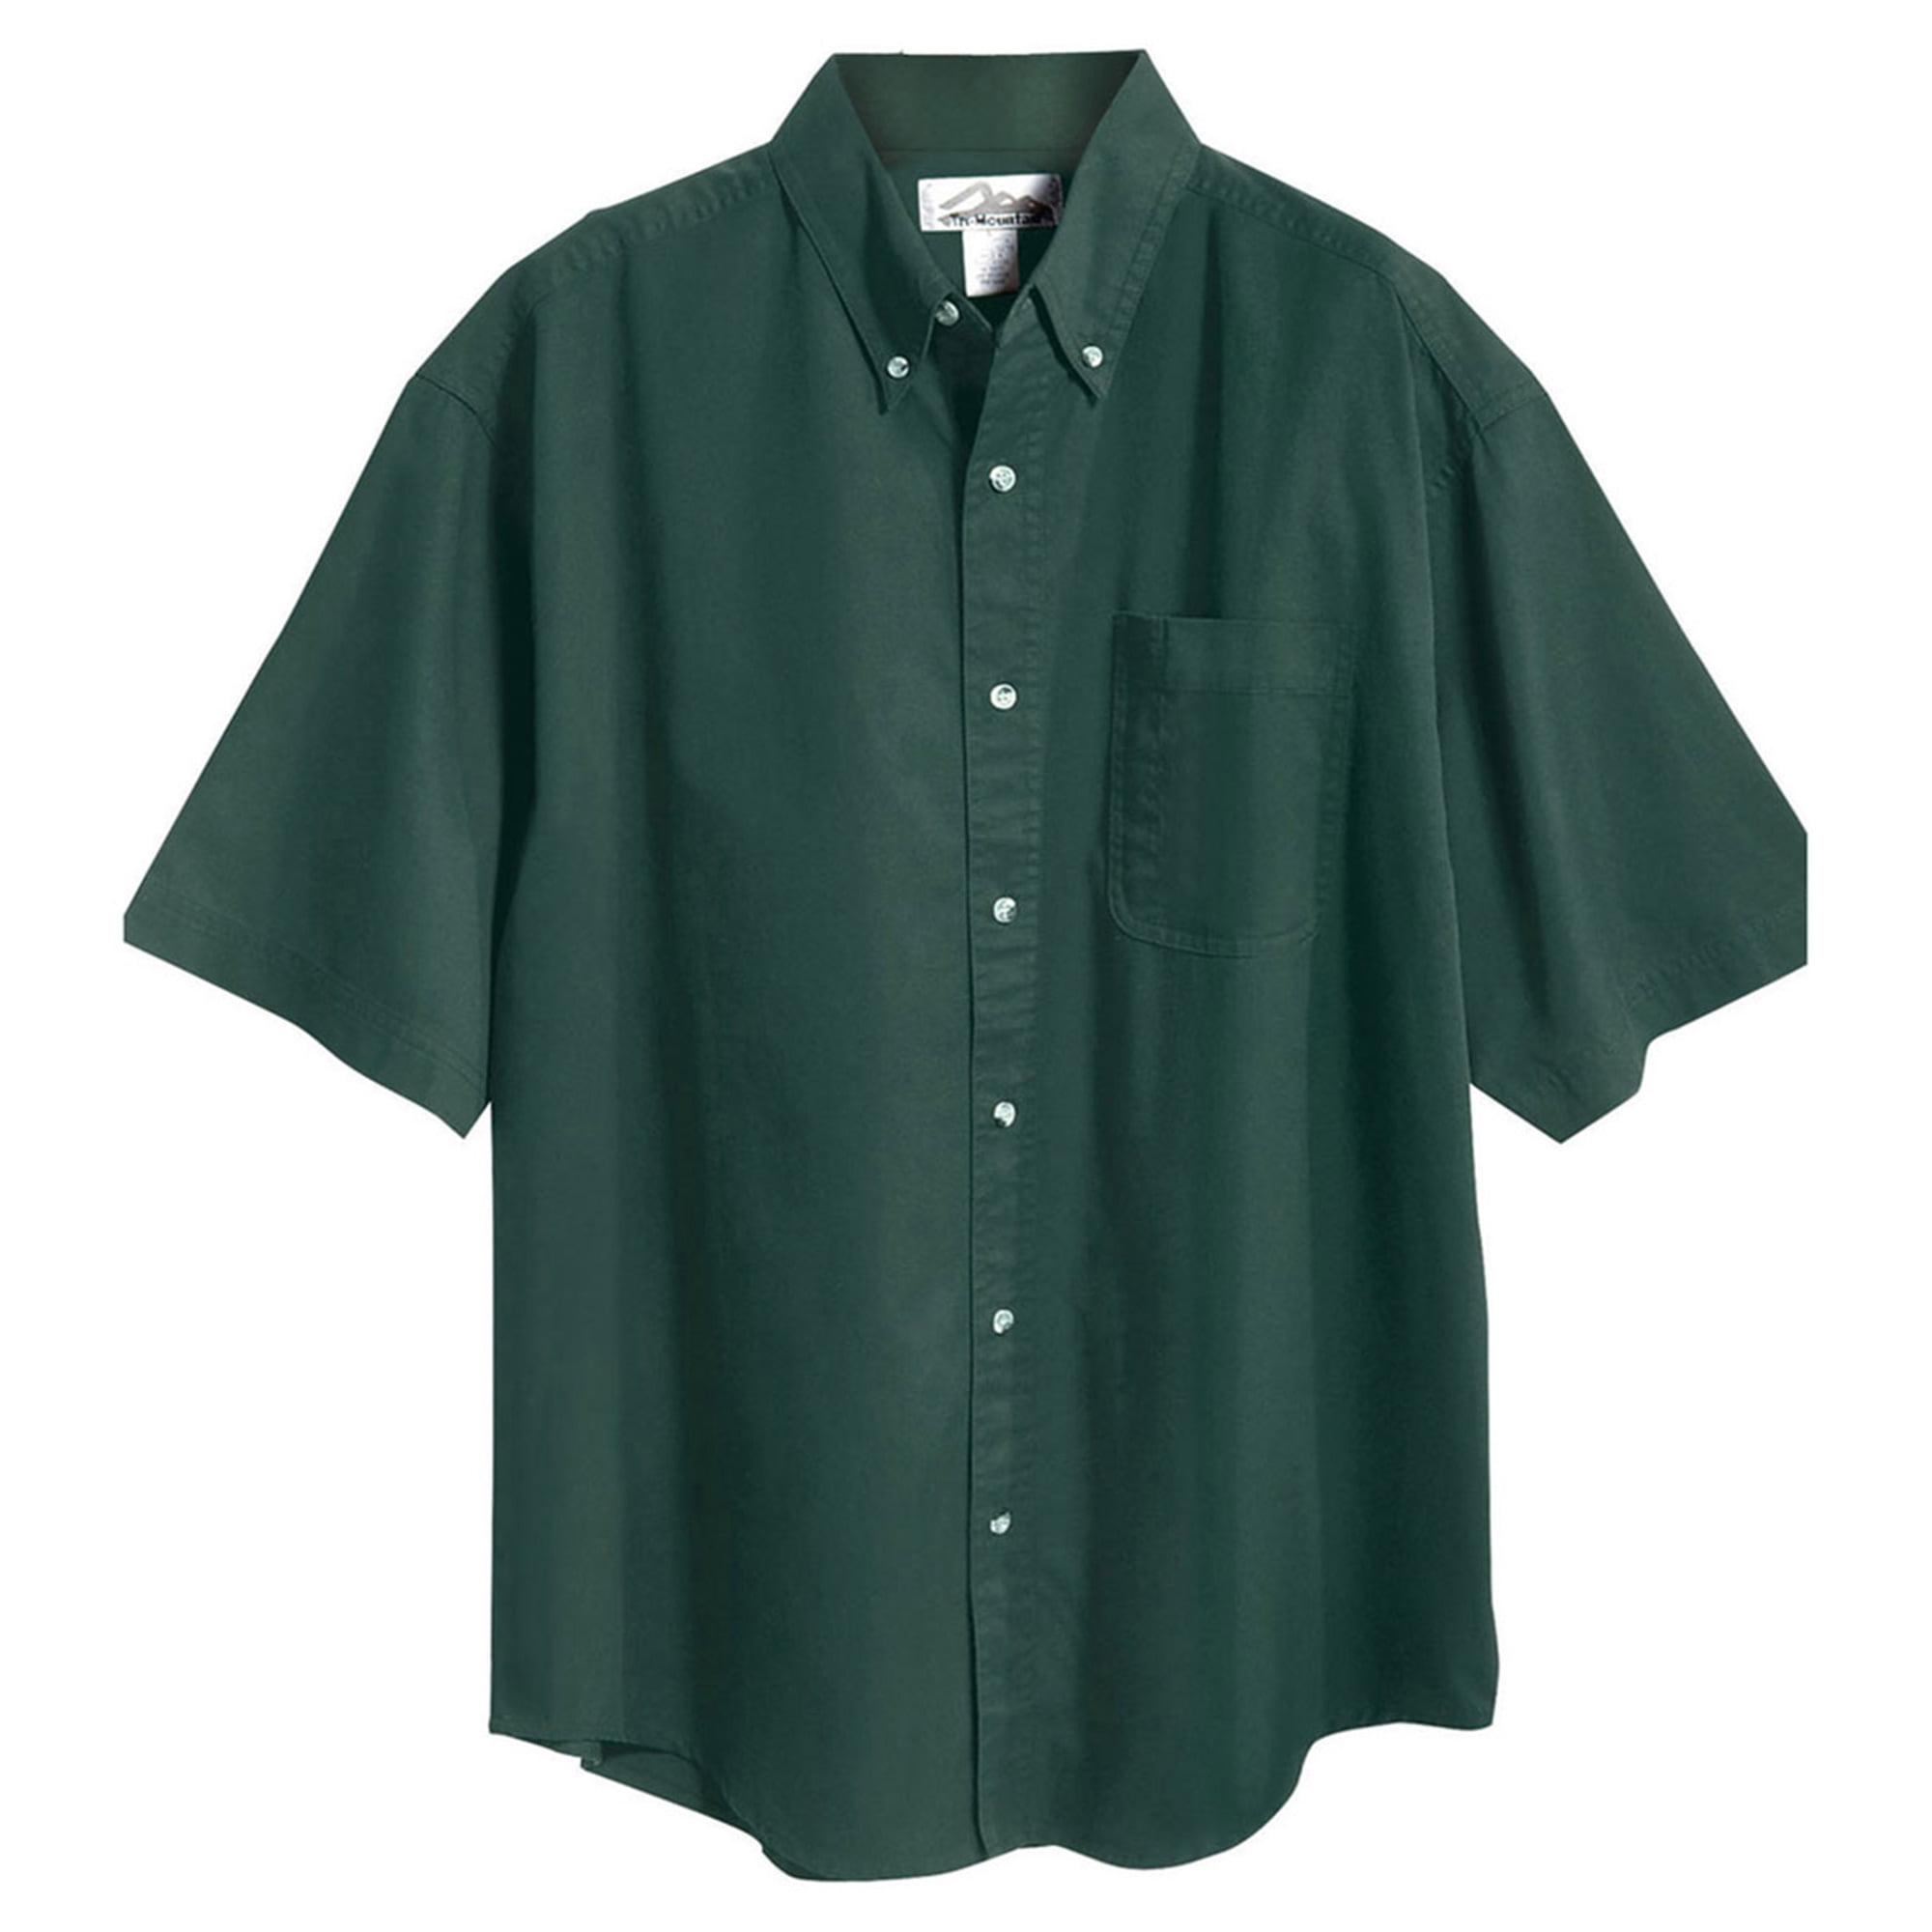 Tri-Mountain Men's Big And Tall Button Down Twill Shirt